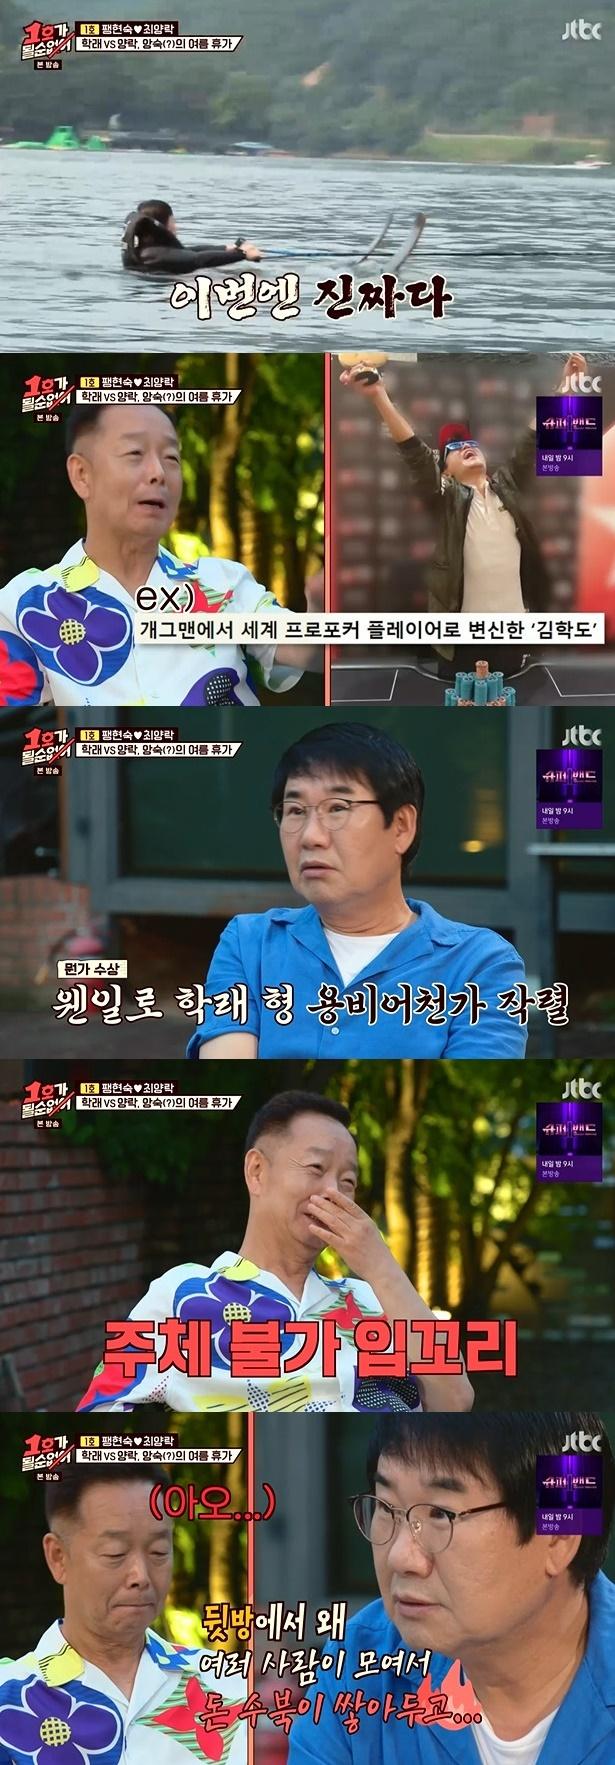 JTBC 캡처 © 뉴스1